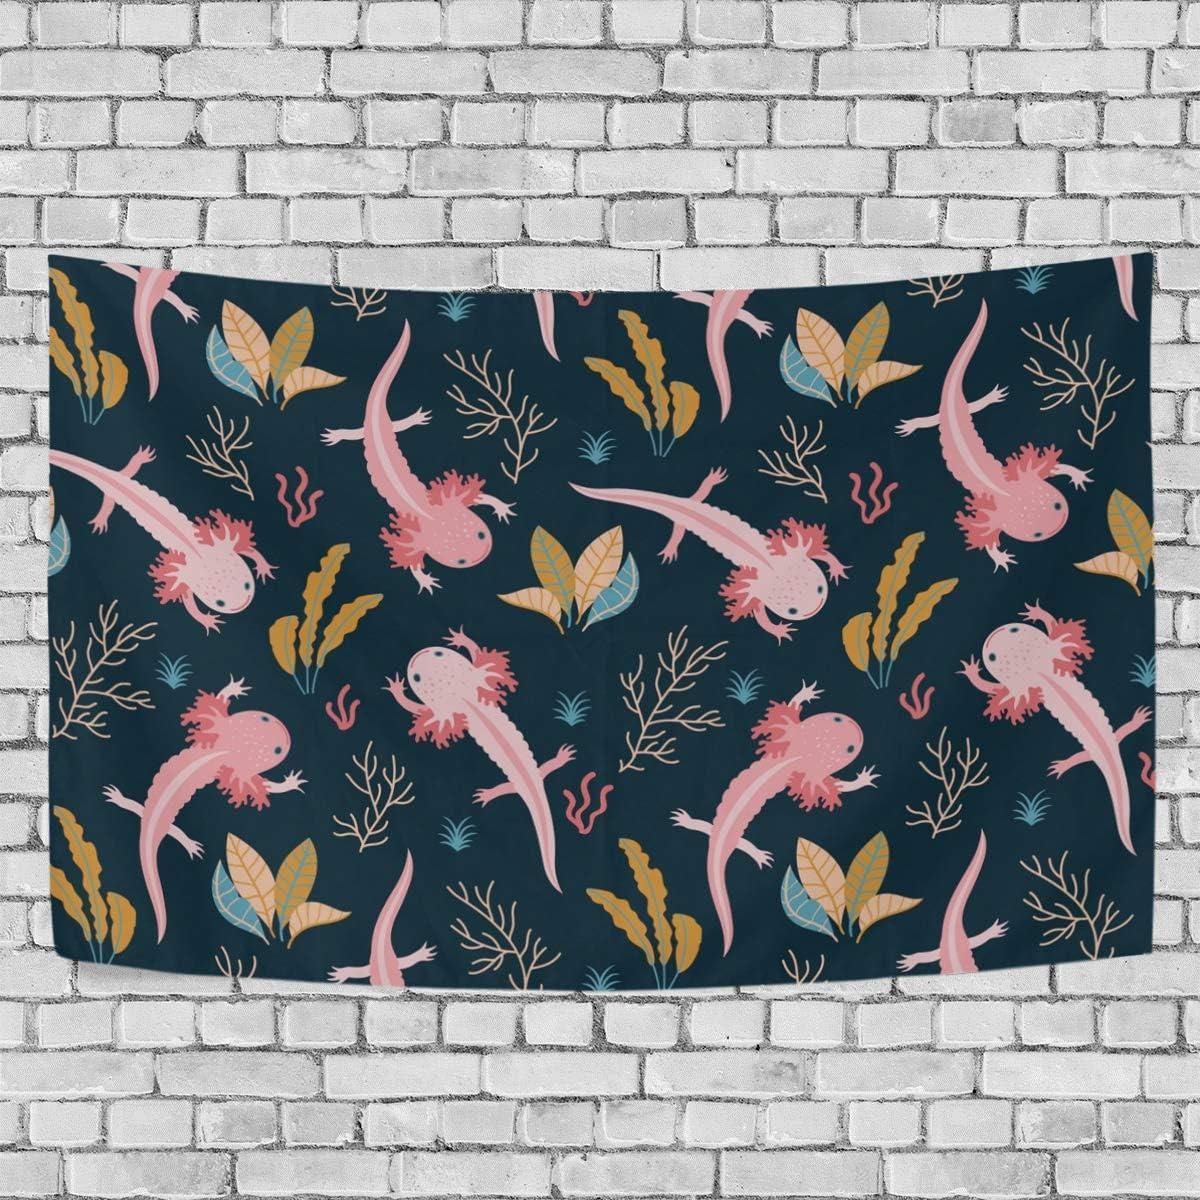 DERLONKAJE Wall Tapestry Axolotl Sea Weed Aquarium Dorm Throw Bedroom Living Room Window Doorway Curtain Home Decor,Tapestry Wall Hanging,90×60 Inch